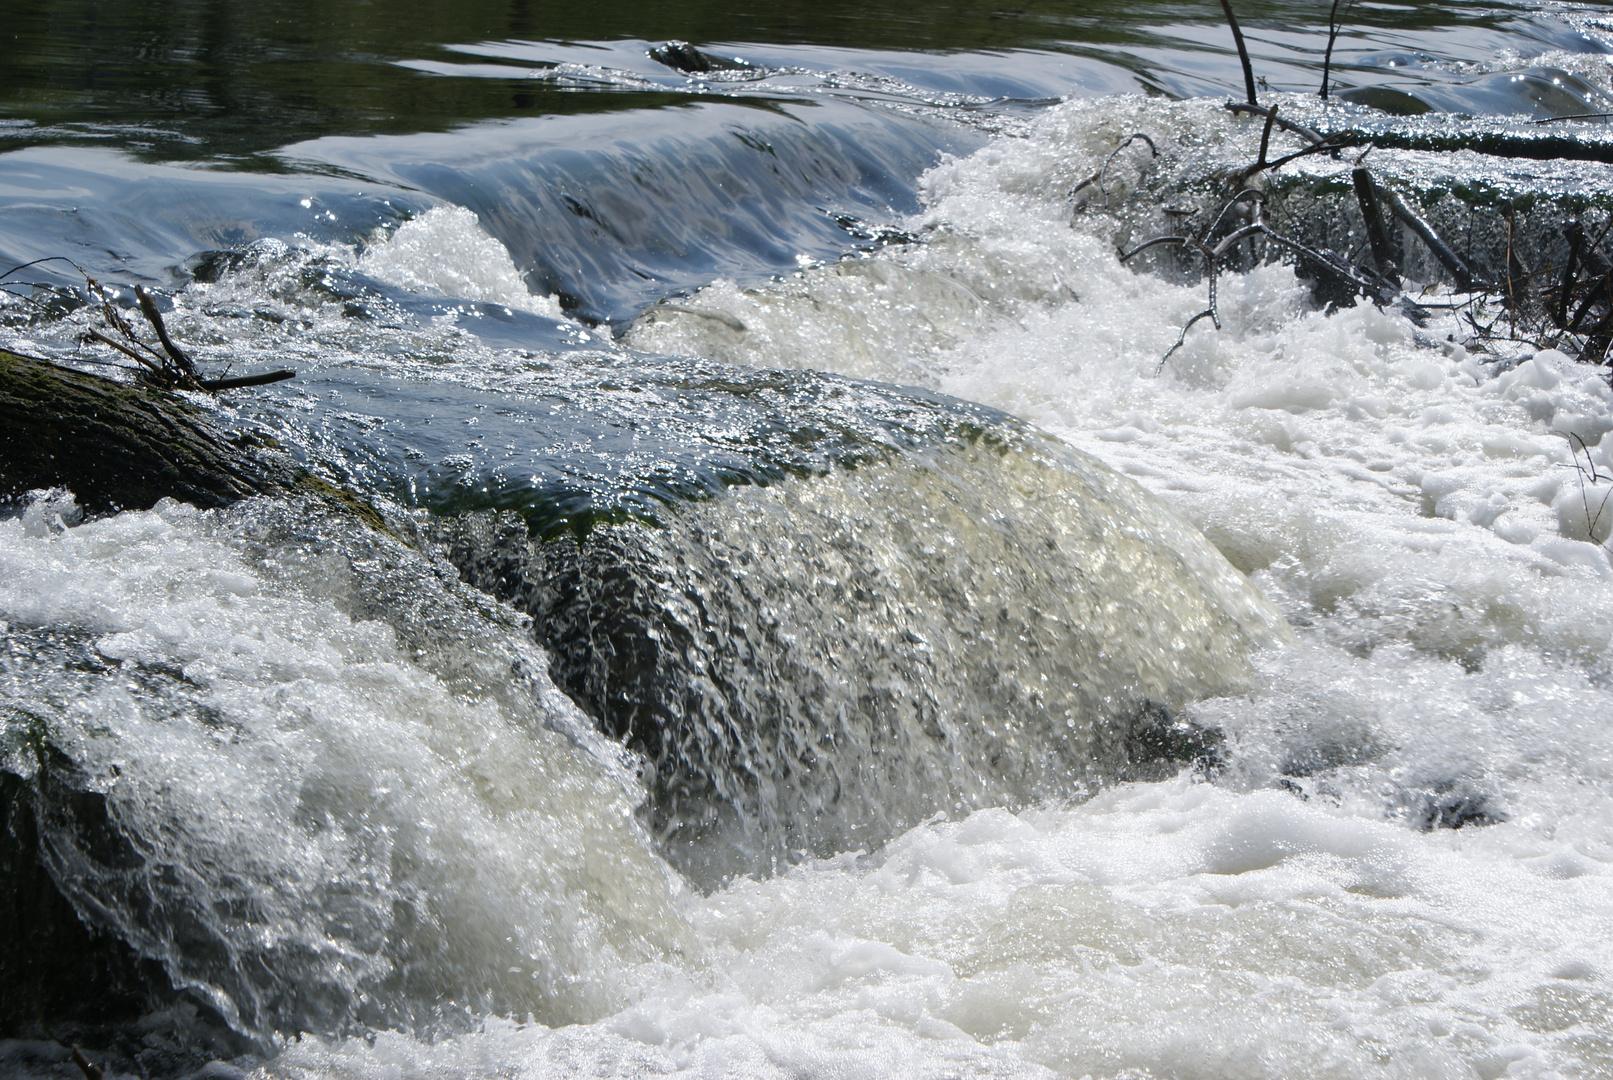 Wasserfall Neustadt 2